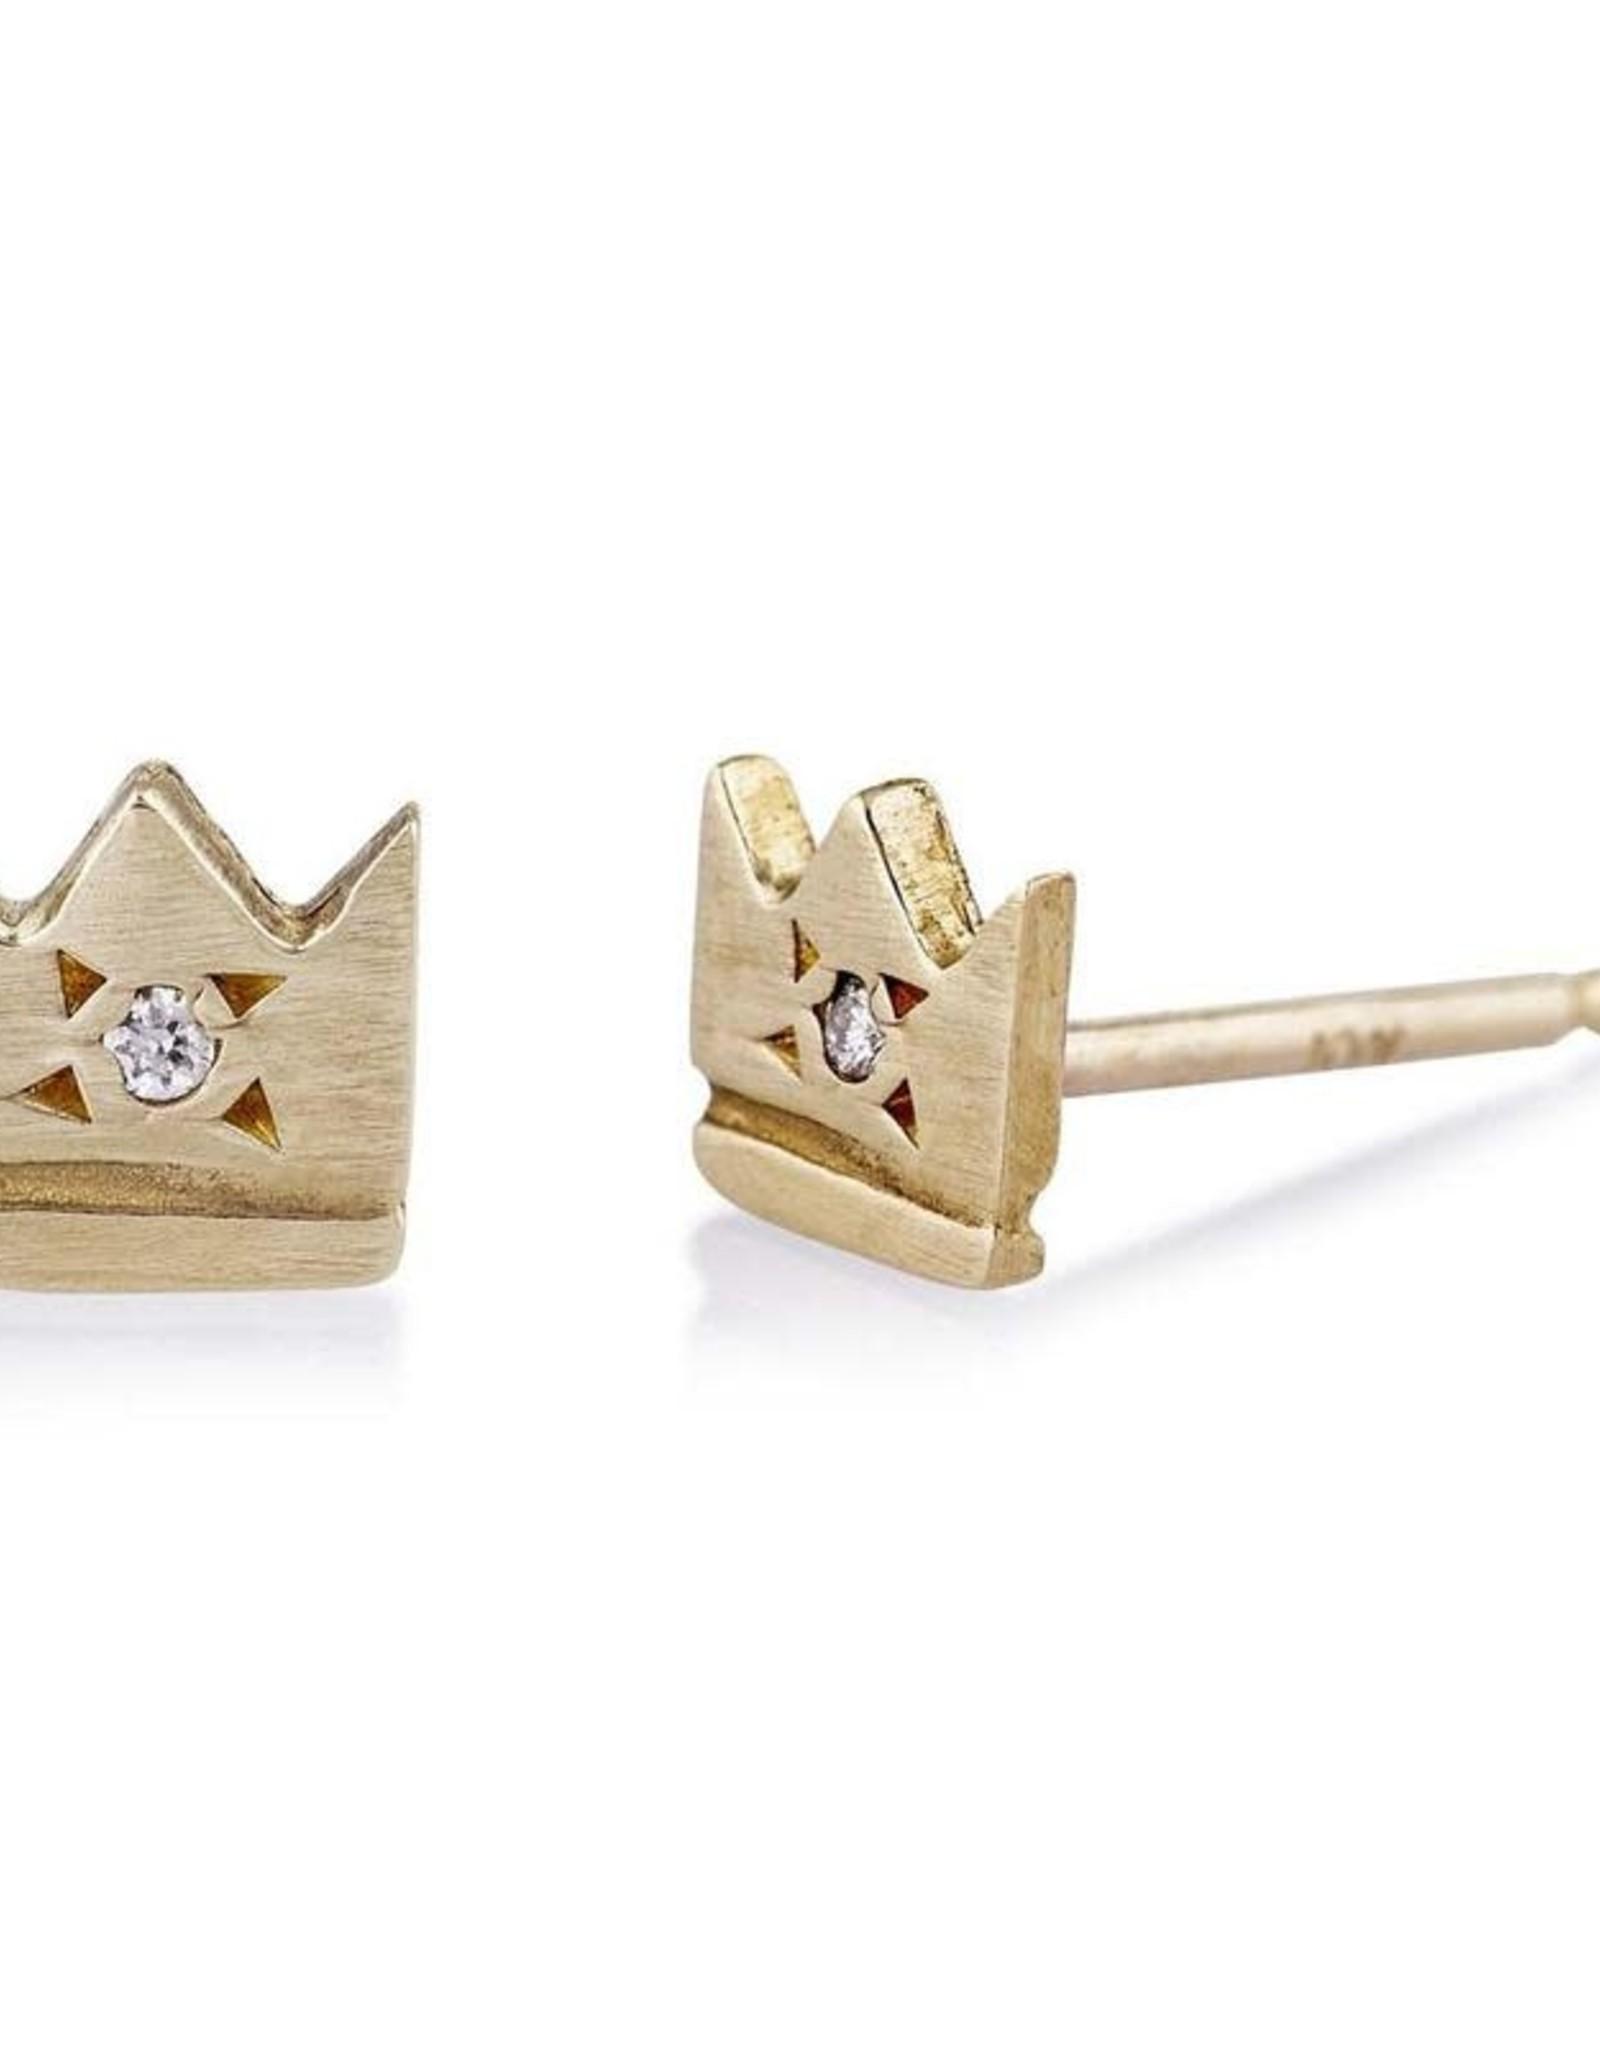 Scosha Crown Stud in Gold w/ Diamond